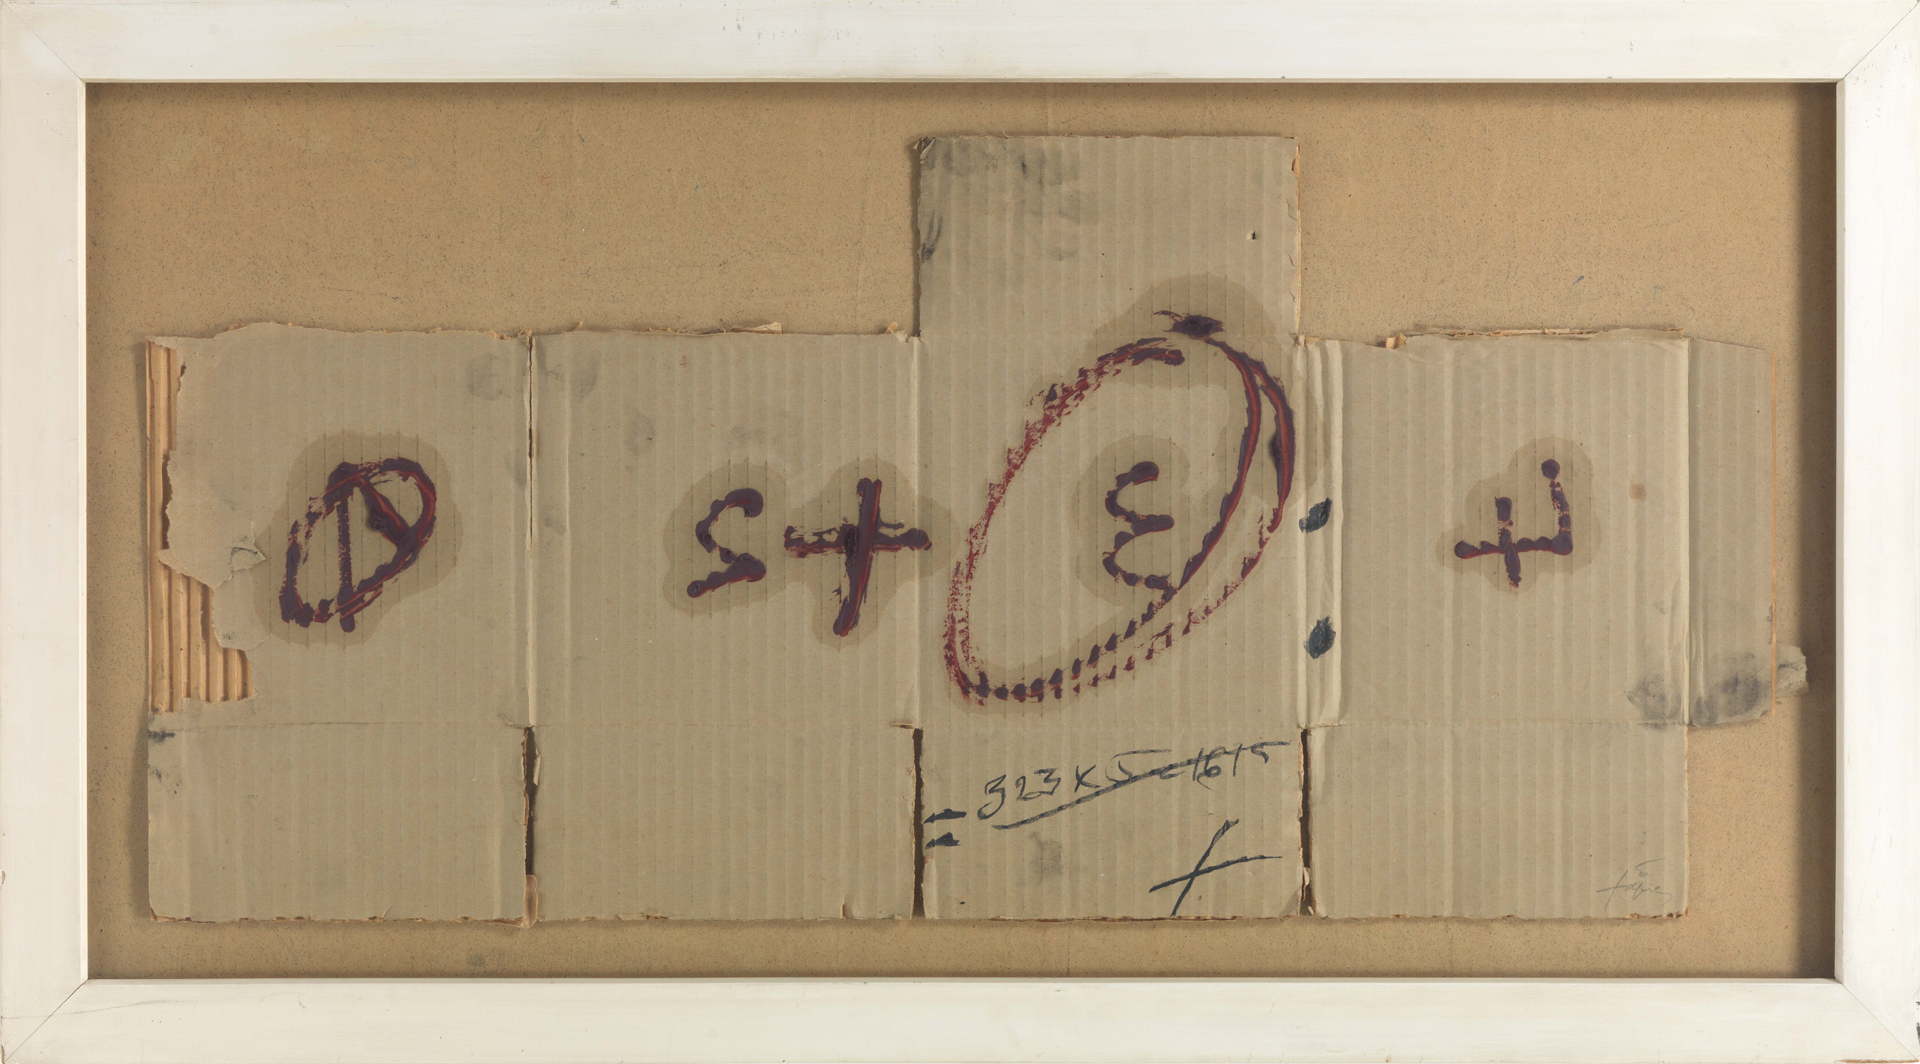 Antoni Tàpies, Cartó amb xifres, 1975, Öl und Gouache auf Wellkarton auf Pavatex, 44,5 x 87 cm